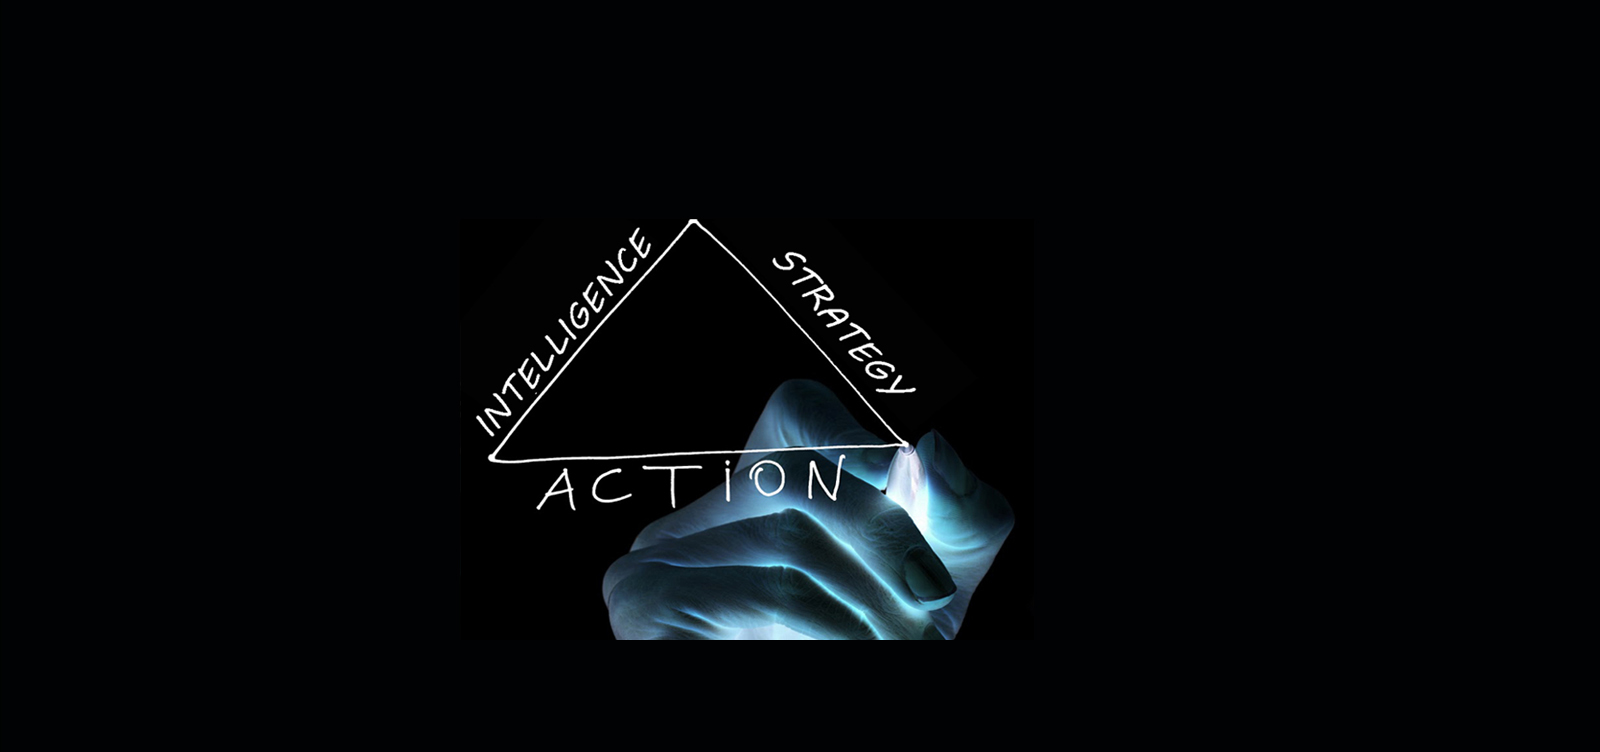 strategy-intelligence-action copiar.jpg